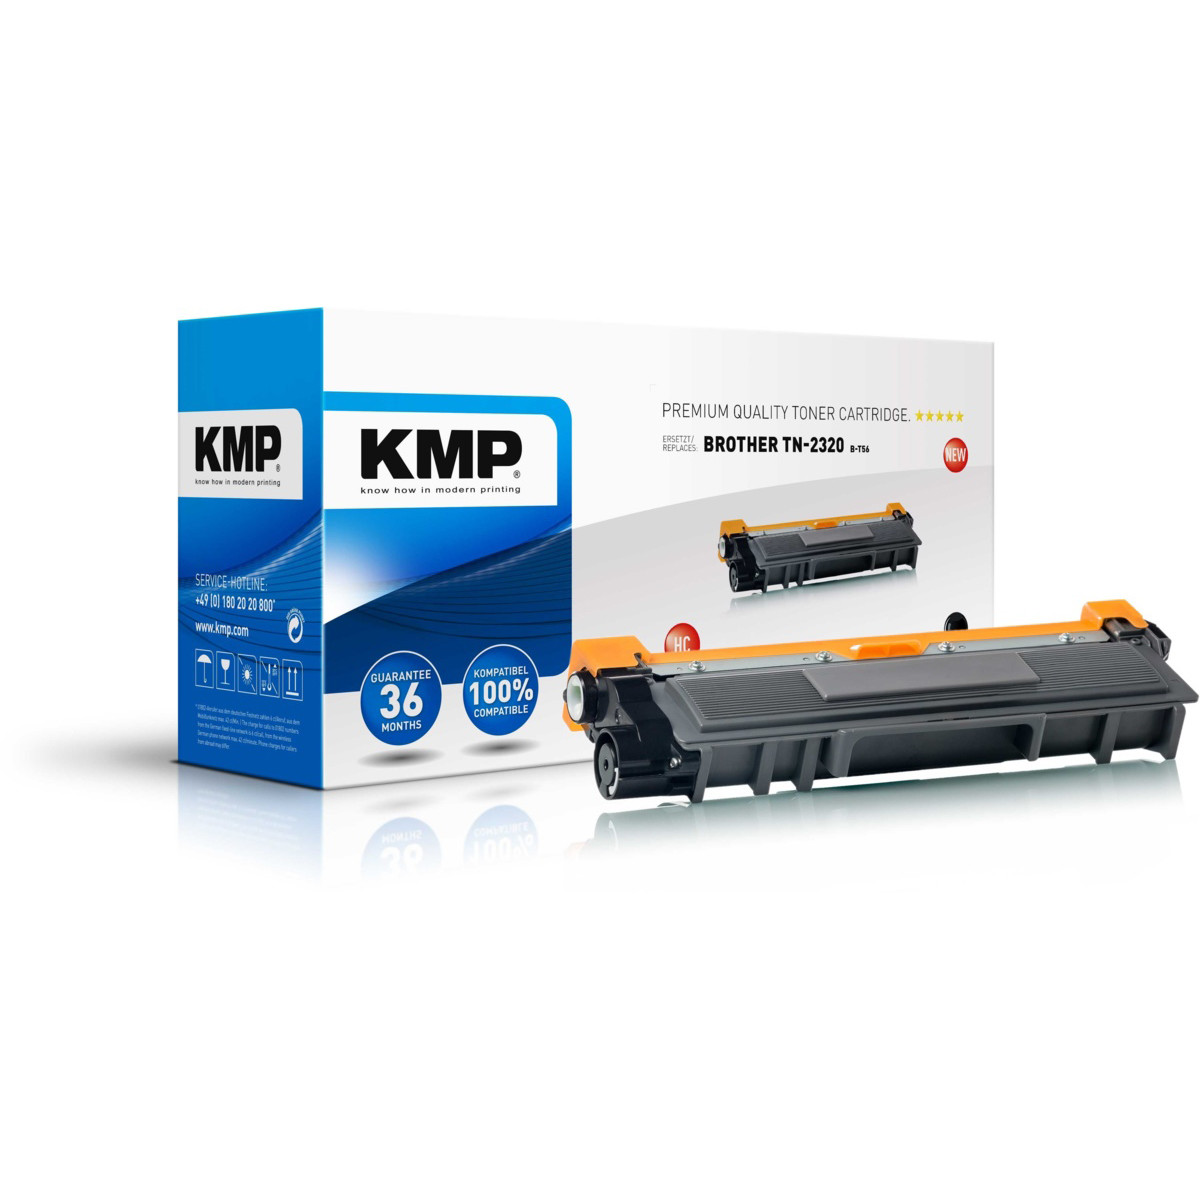 KMP Toner Brother TN-2320, - kompatibilný s čipom (Čierna)